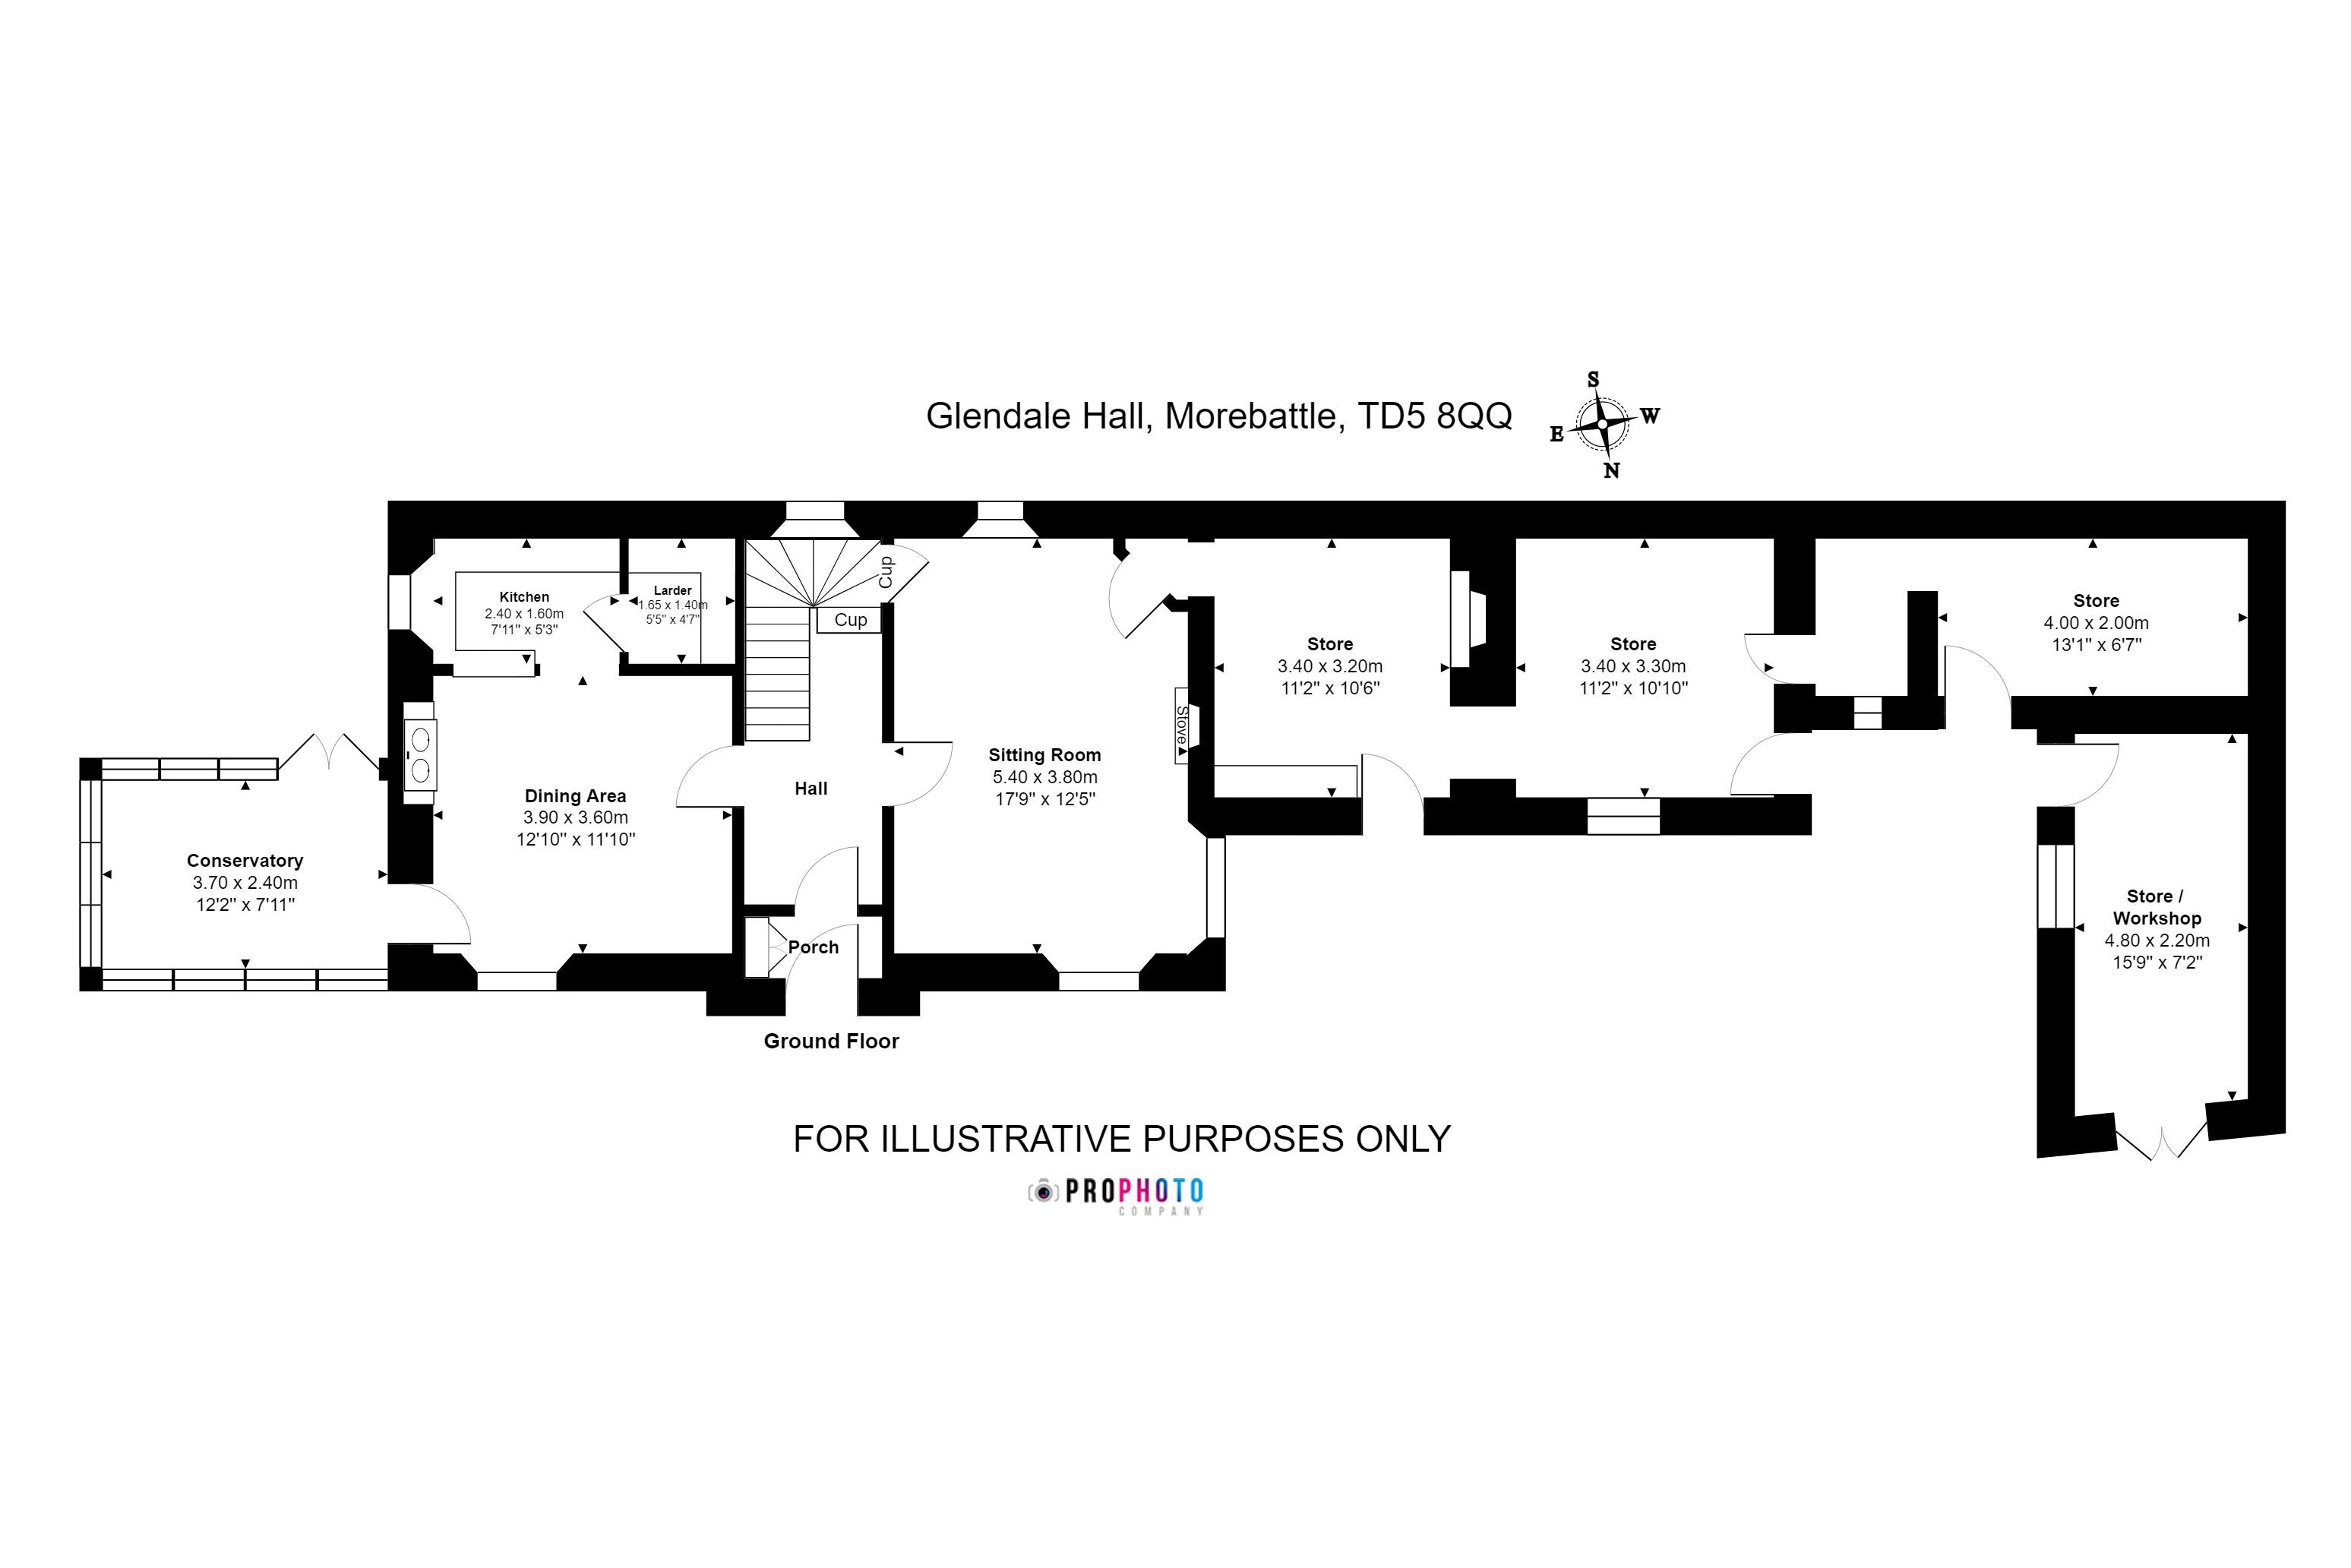 Glendale Hall Ground Floor